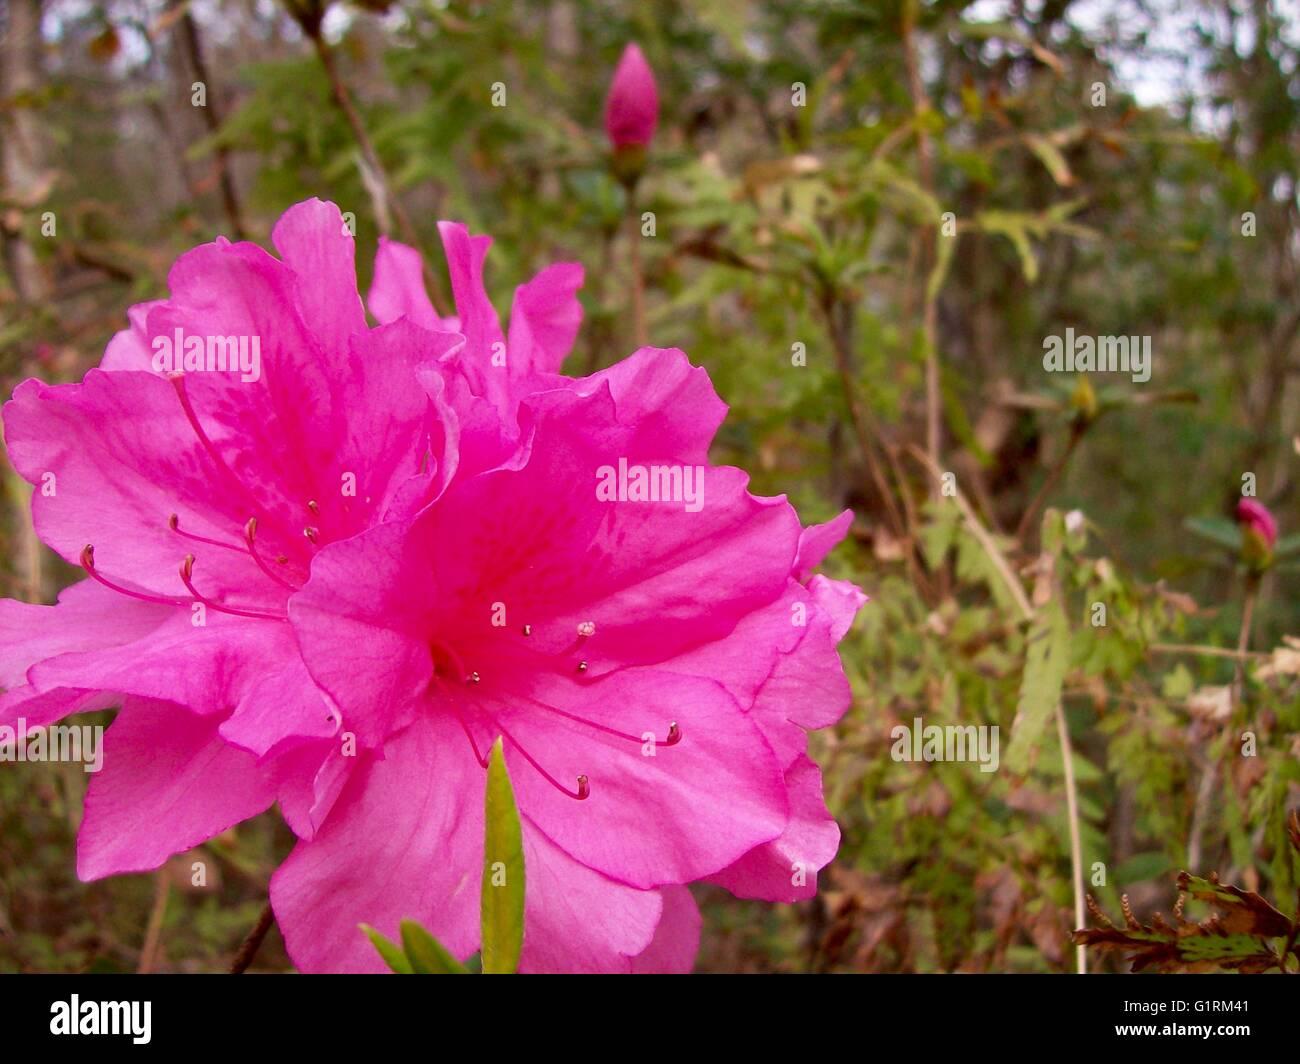 Cluster Of Pink Azalea Flowers Stock Photo 104397553 Alamy